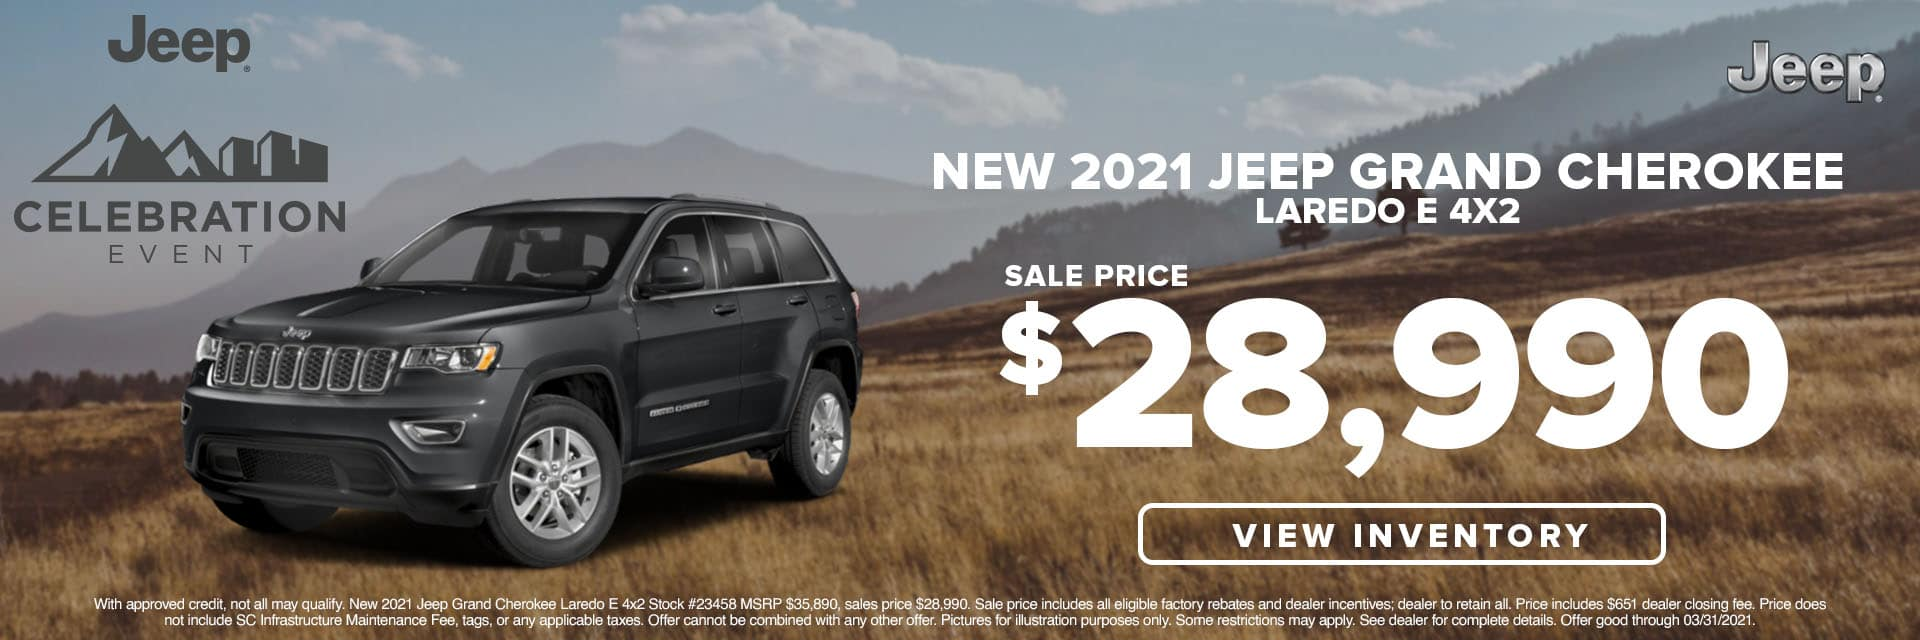 SLCJ-March 2021-2021 Jeep Grand Cherokee1